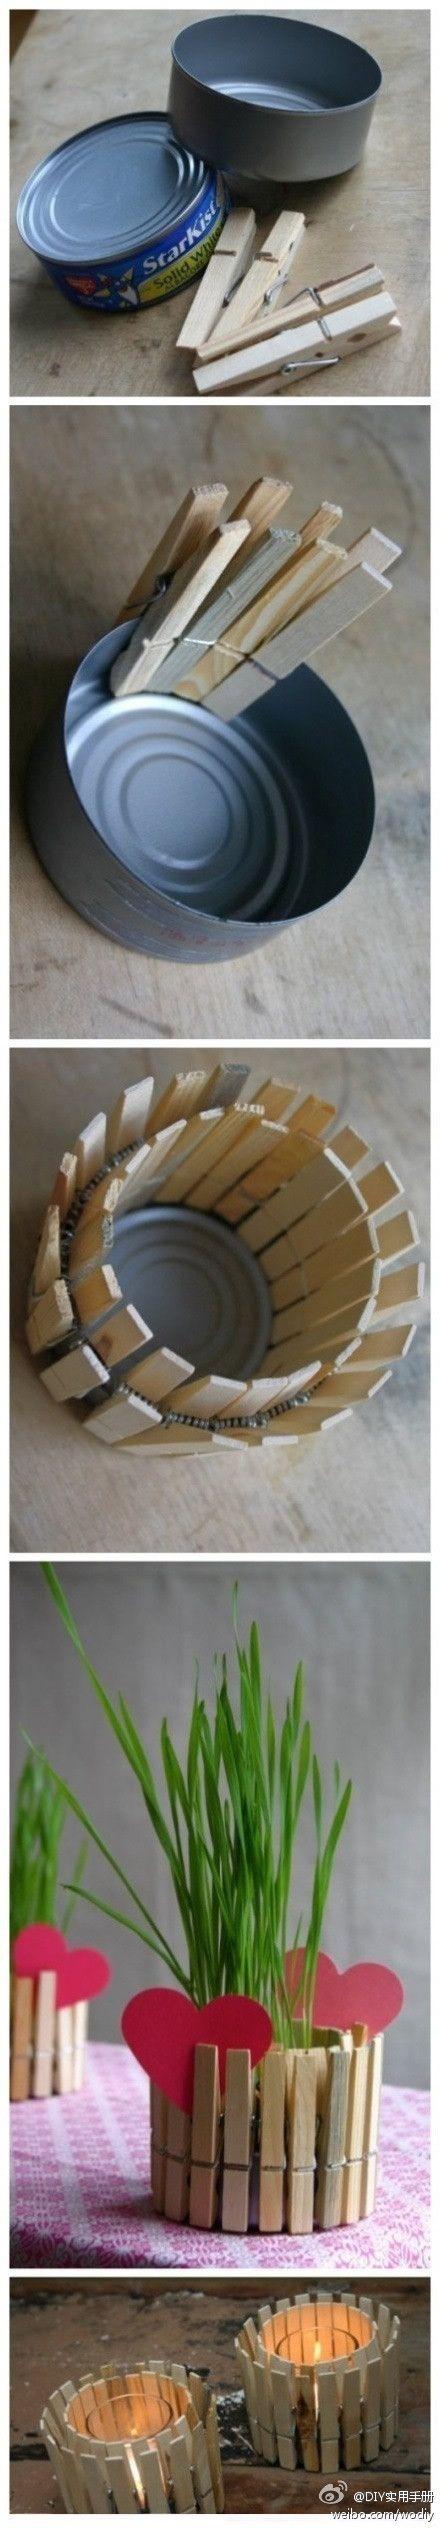 DIY Clothespin Crafts